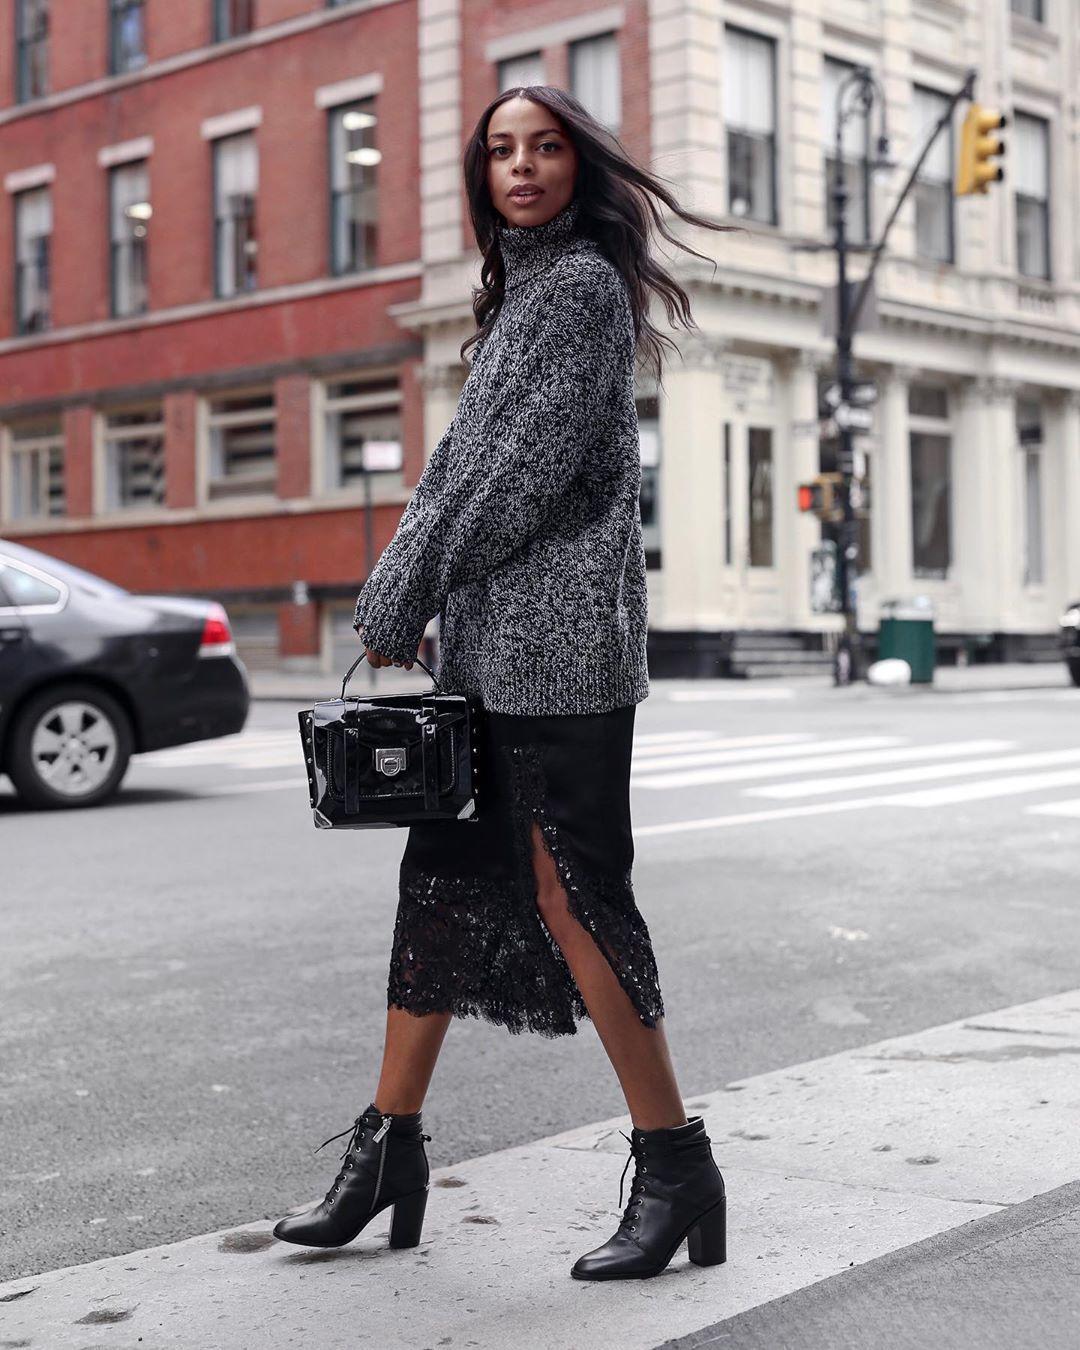 sweater turtleneck sweater ankle boots black boots midi skirt lace skirt blakc bag michael kors